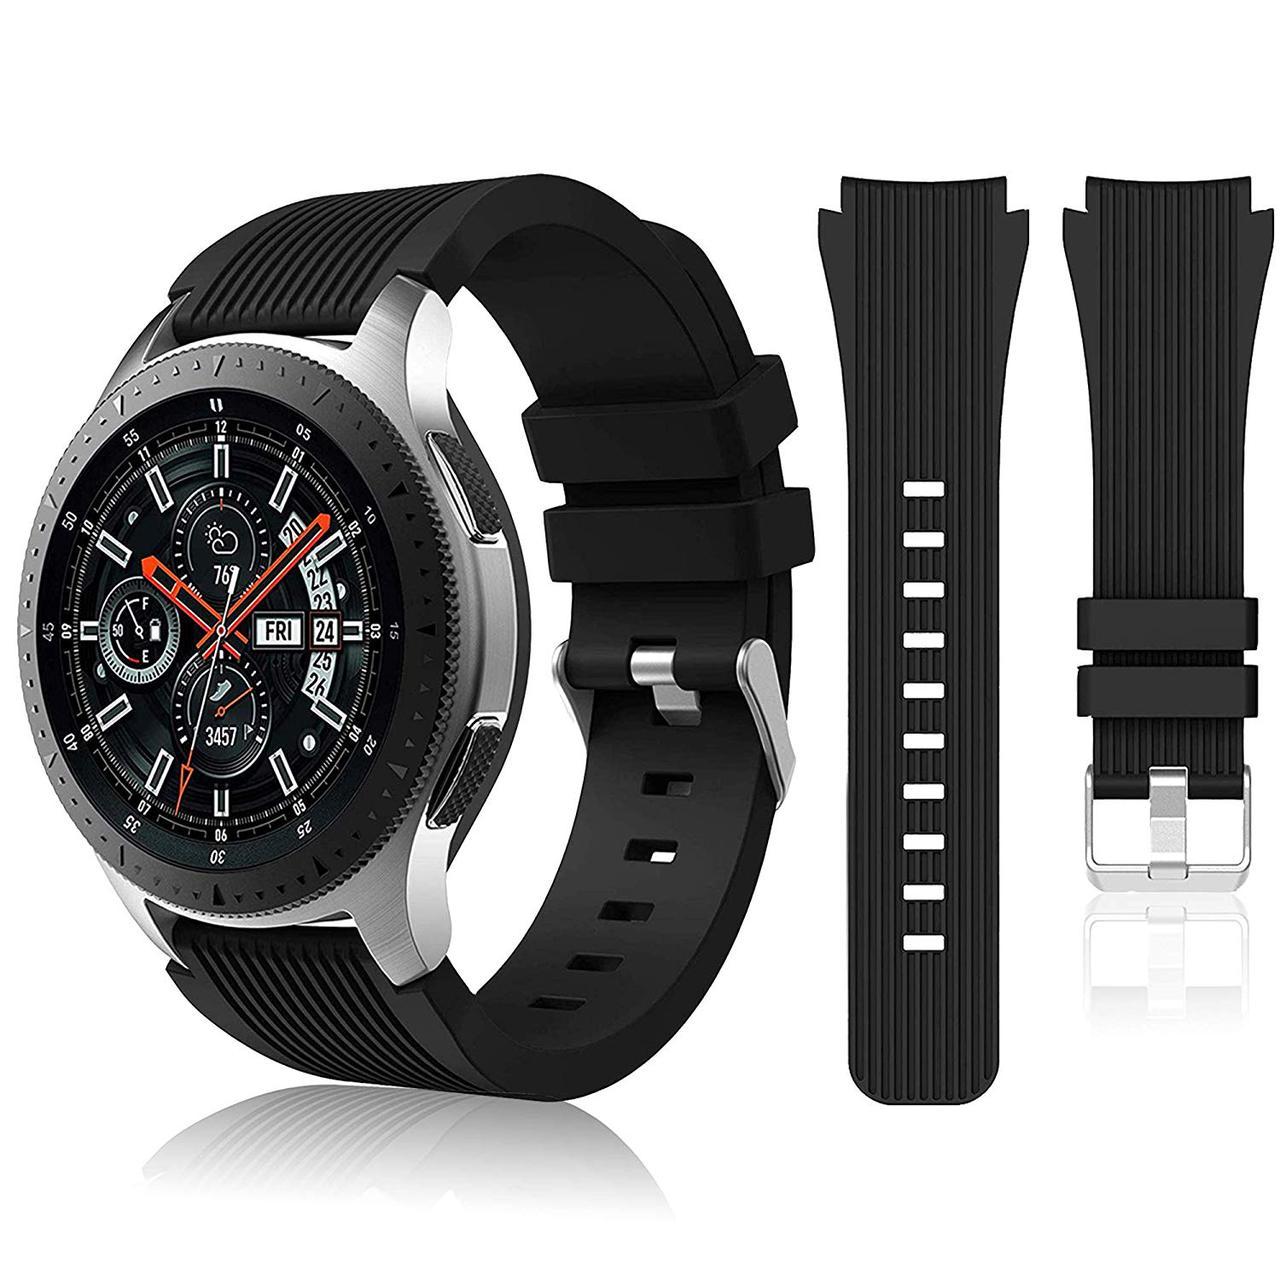 Ремінець BeWatch шириною 22 мм для Samsung Galaxy Watch 46mm \ Gear S3 Чорний (1022101)